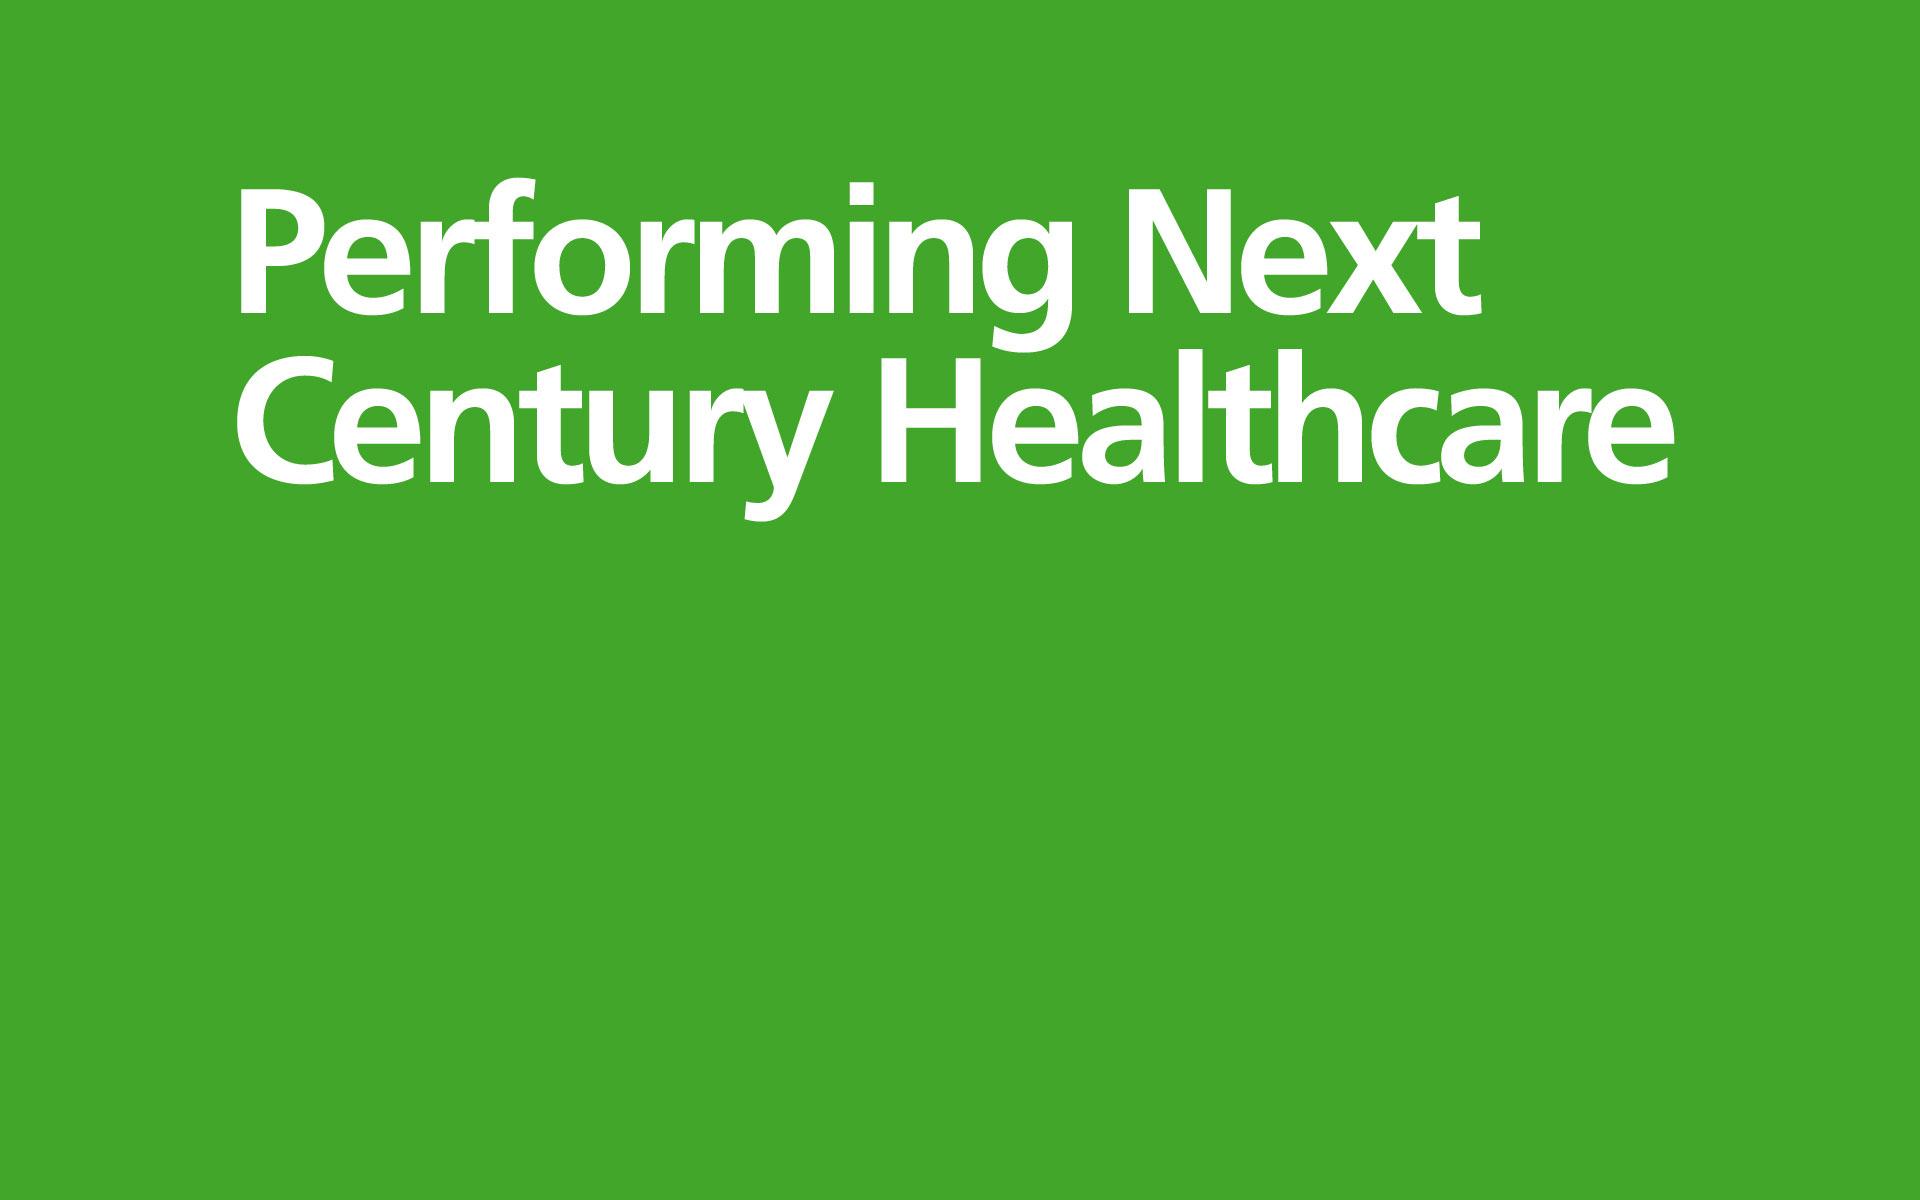 Vanguard – Performing Next Century Healthcare